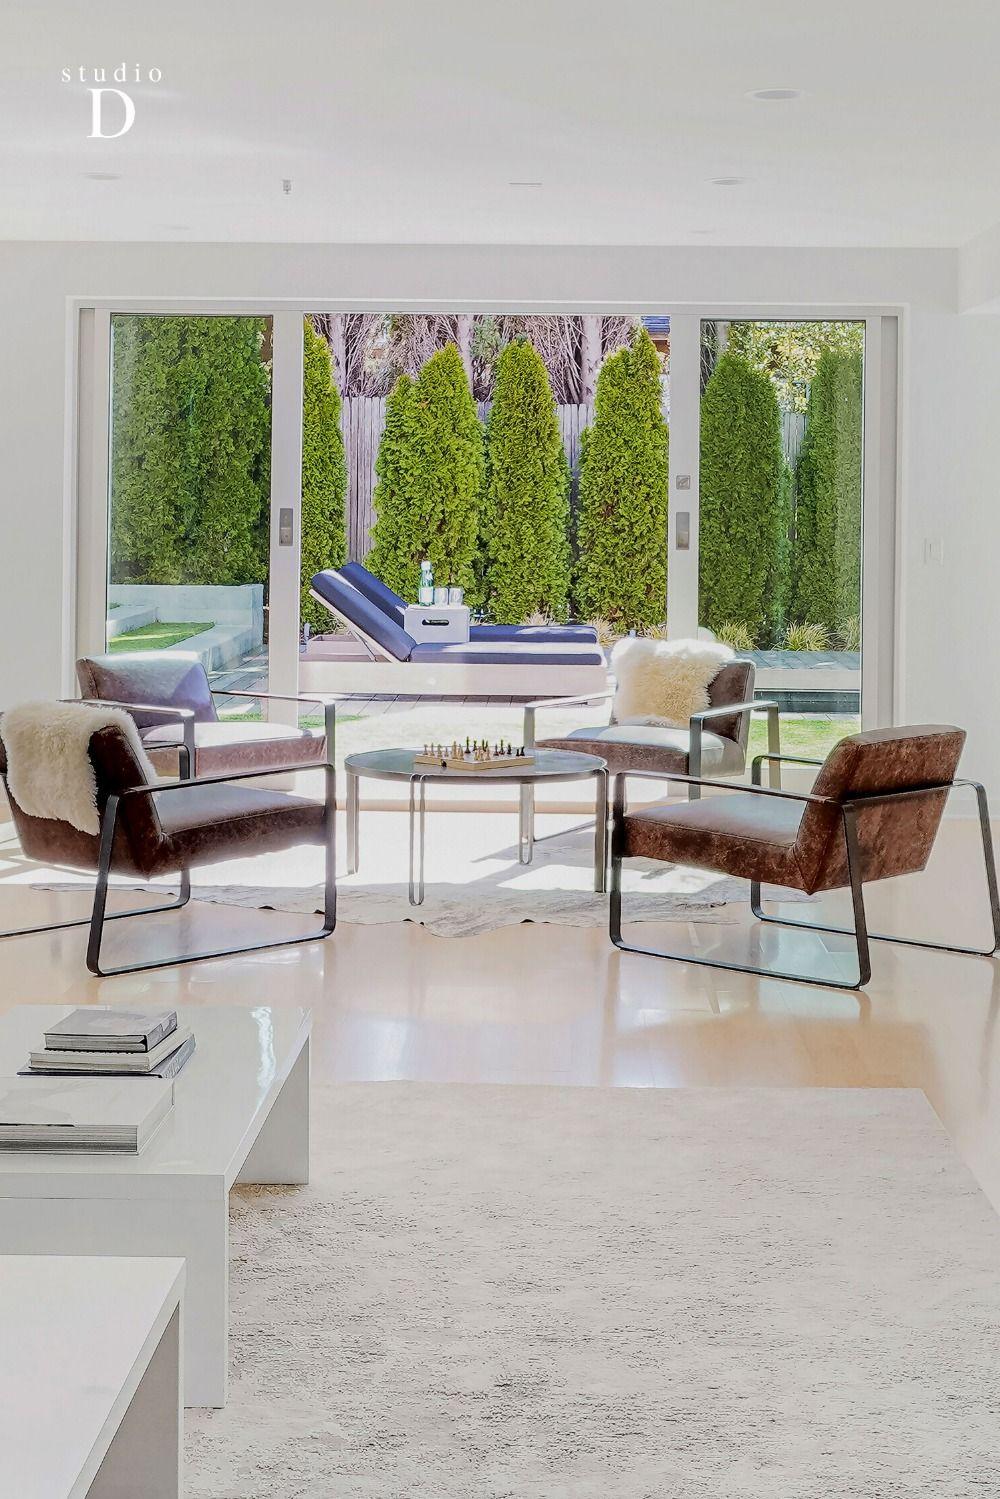 14 Mann Dr, Kentfield CA   #Modern #leather #chairs #livingroom in #california #contemporary #home #marin   #homestaging #interiordesign #designinspo #carealestate #bayarearealestate #bayarea #luxuryrealestate #luxuryhome #luxury #stagedbystudioD